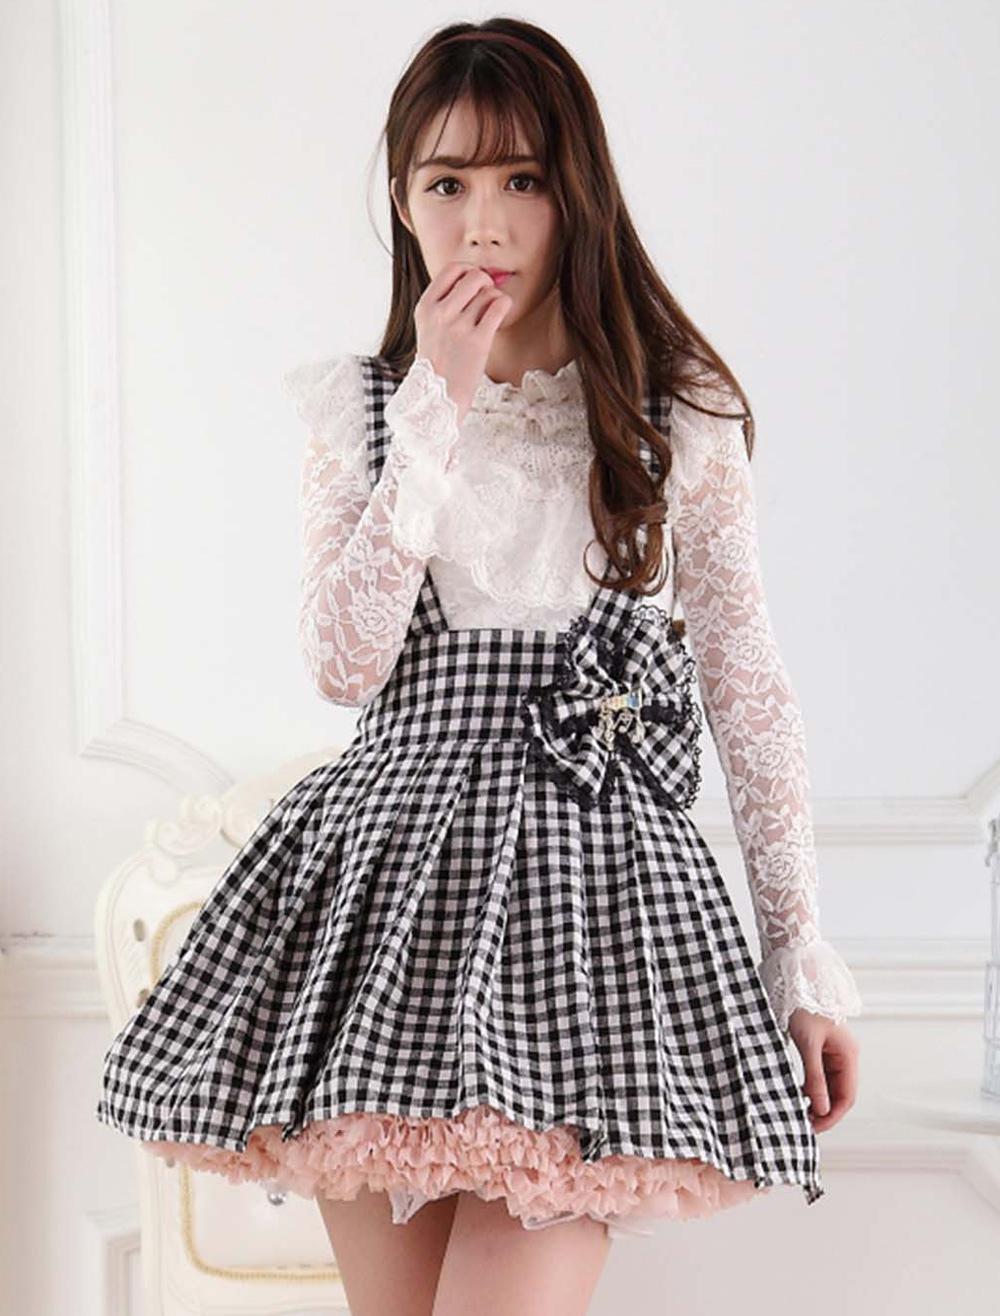 Sweet Lolita Dress SK Check Bow Lolita Suspender Skirt